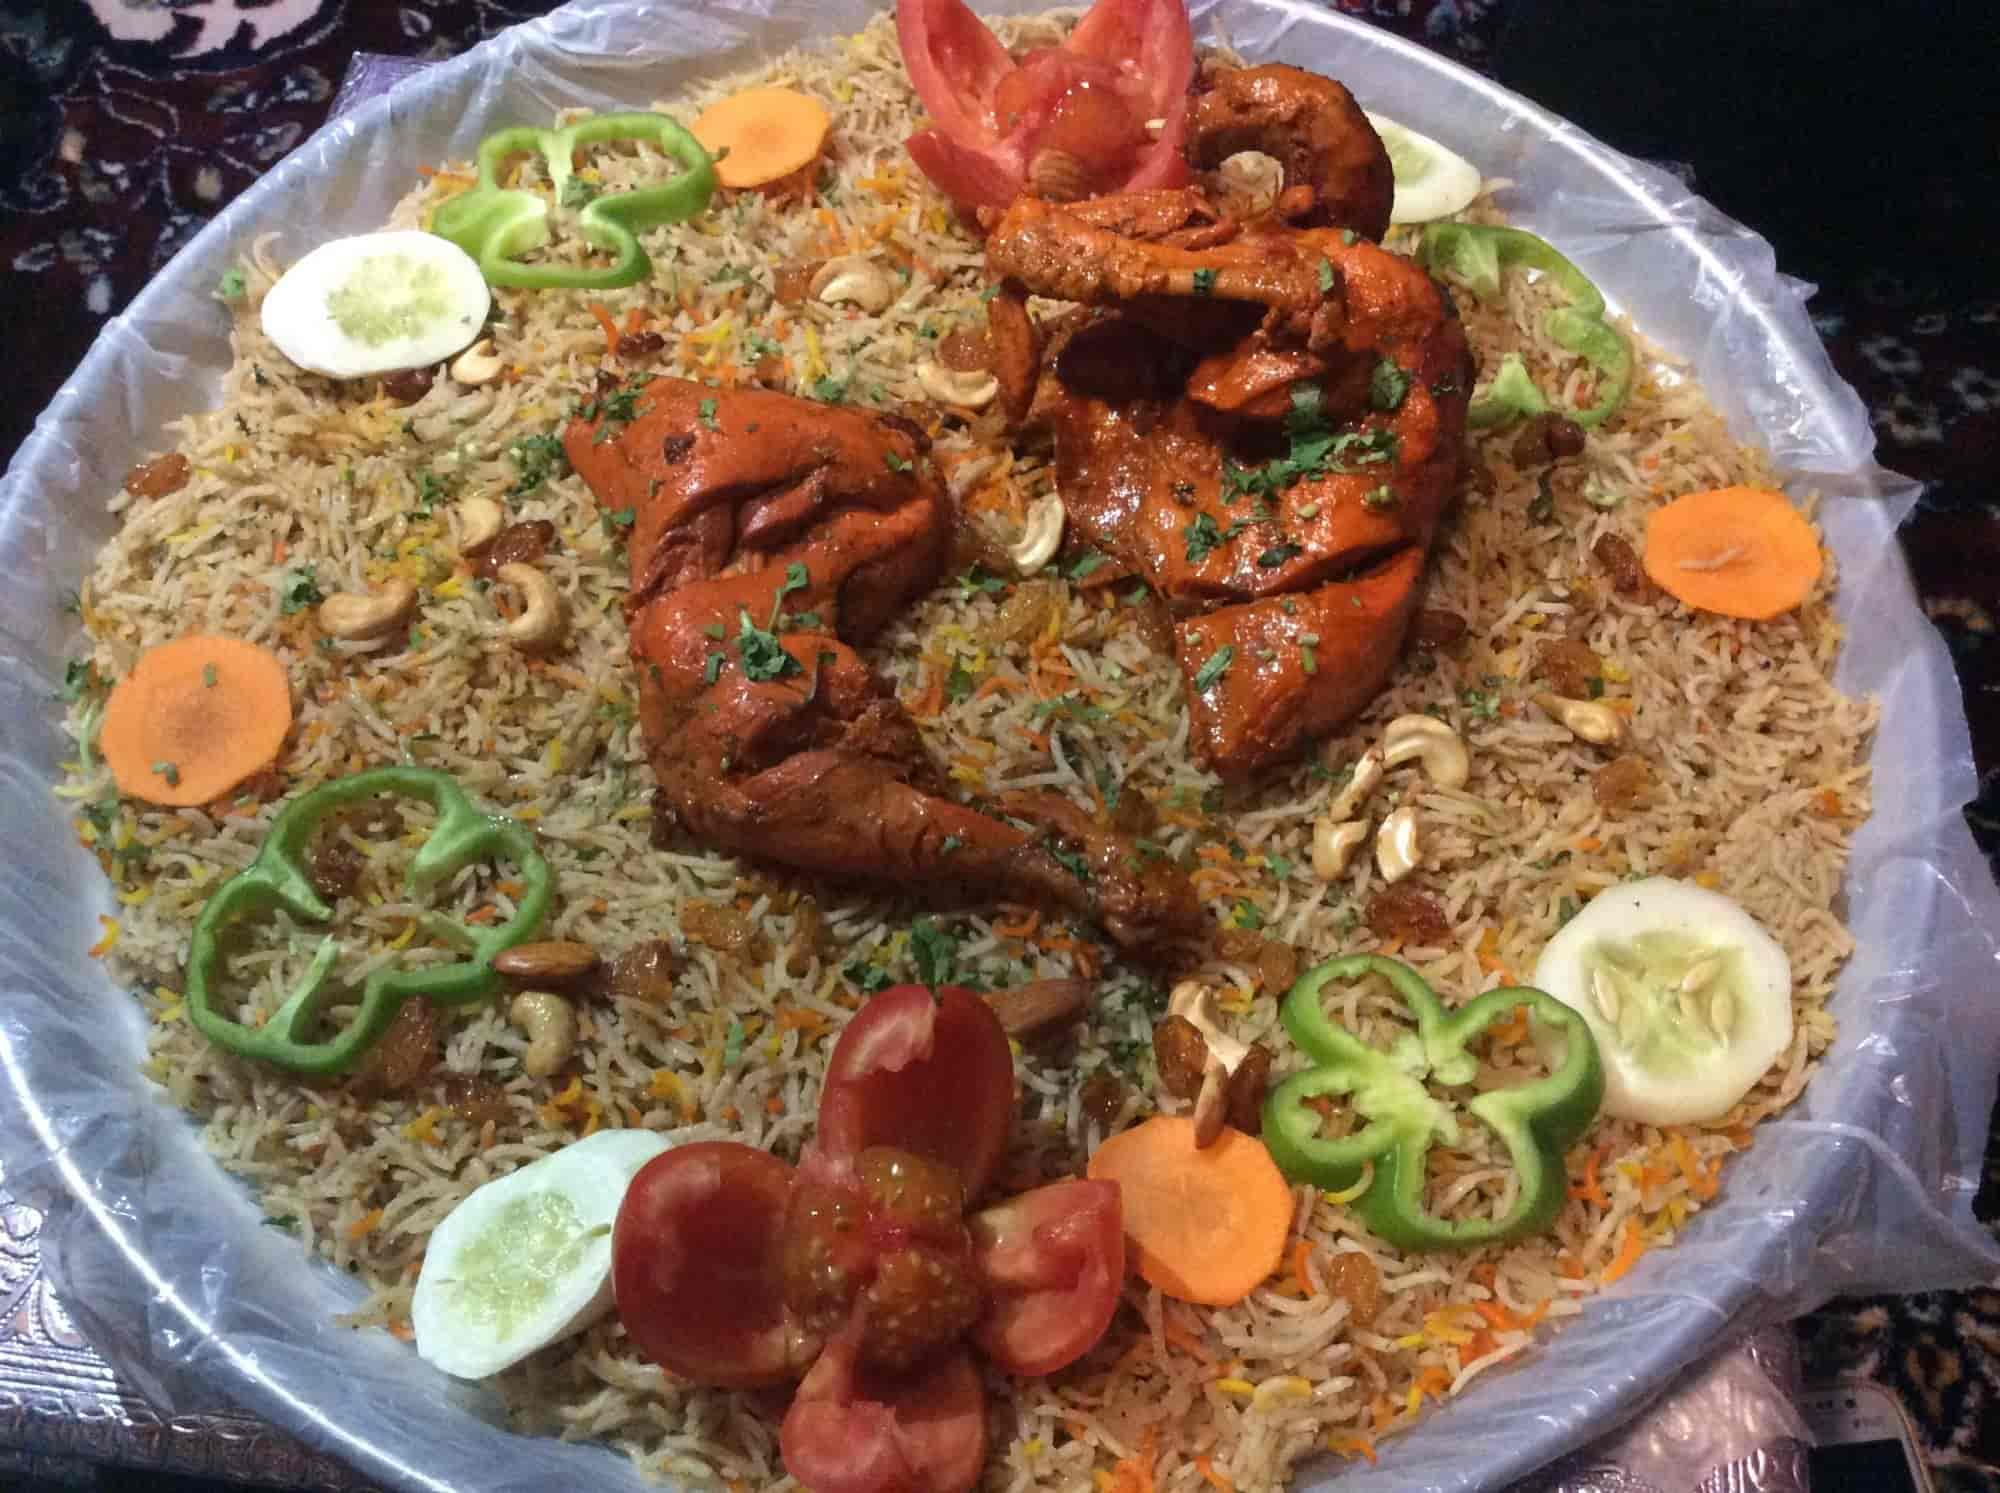 bait al mandi arabian multi cuisine restaurant mandi bazaar